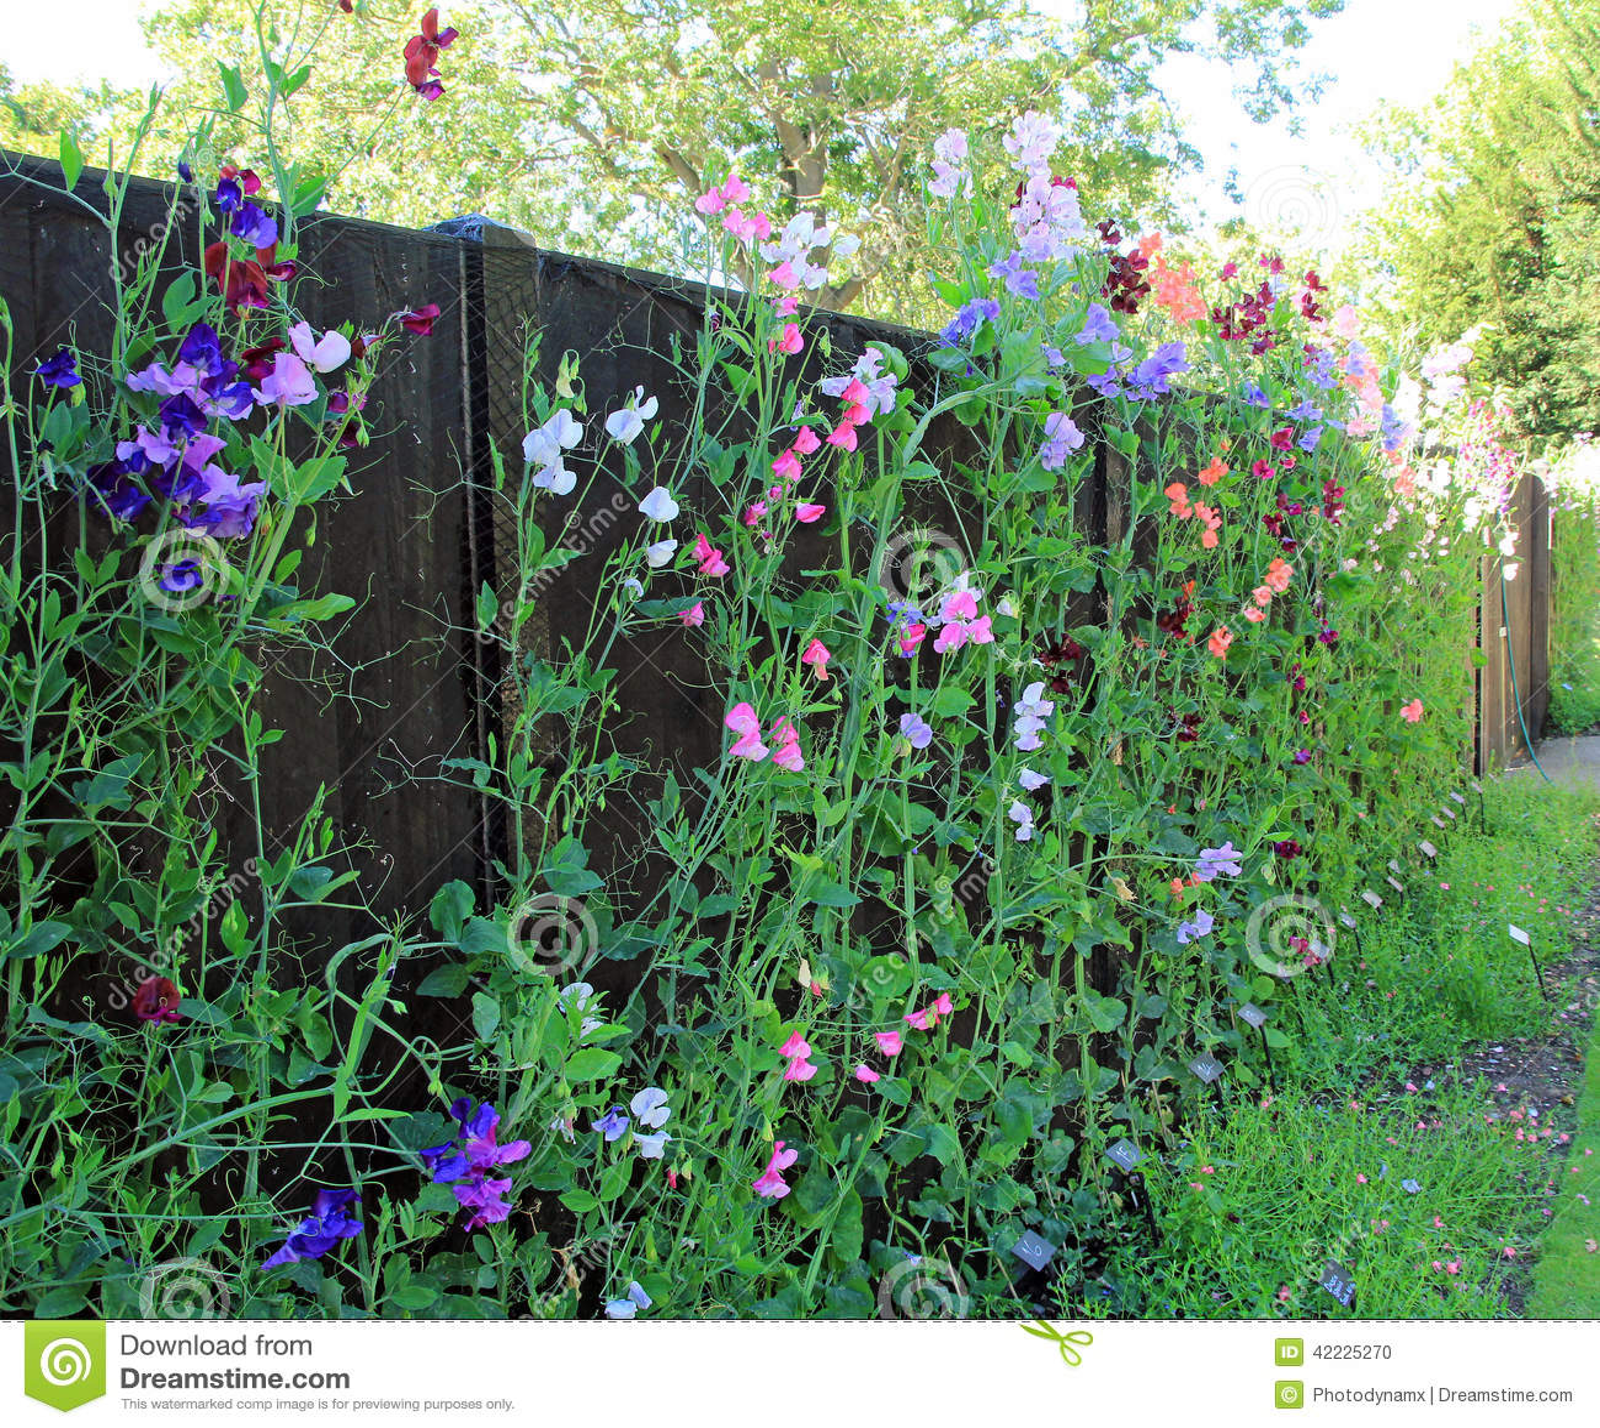 Heavenly Sweet Peas Stock Photo Image 42225270